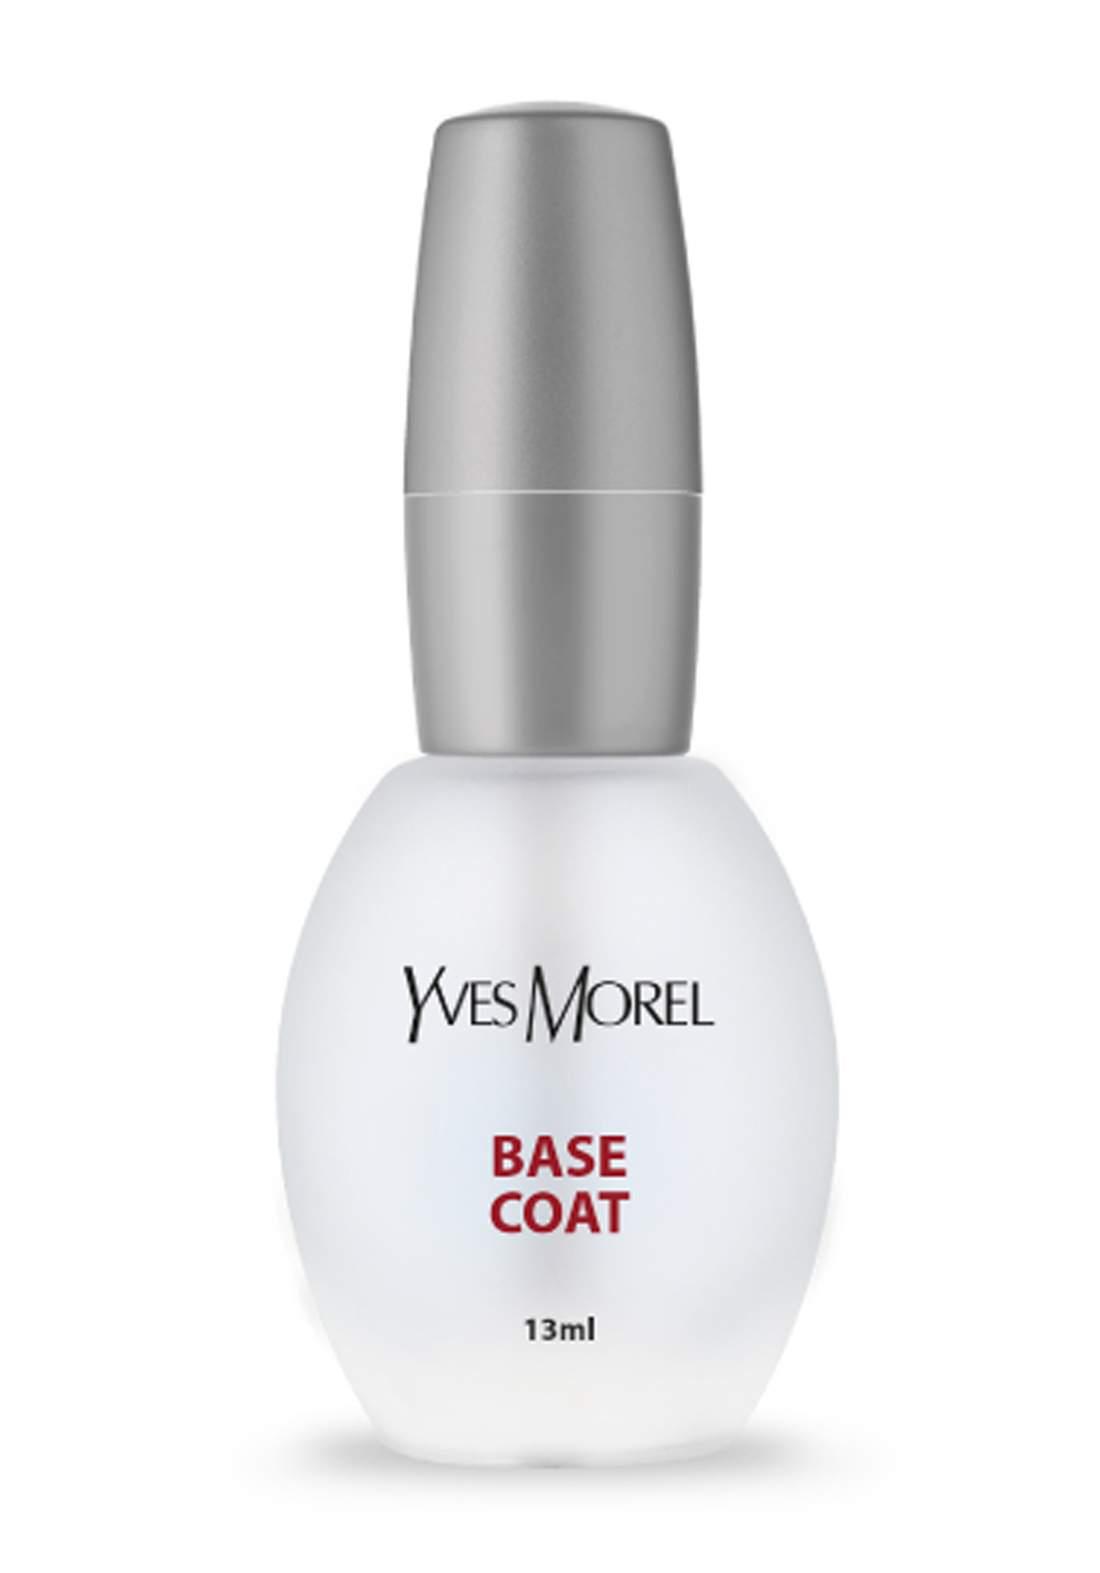 Yves Morel Nail Base Coat 13ml قاعدة ترطيب للاظافر